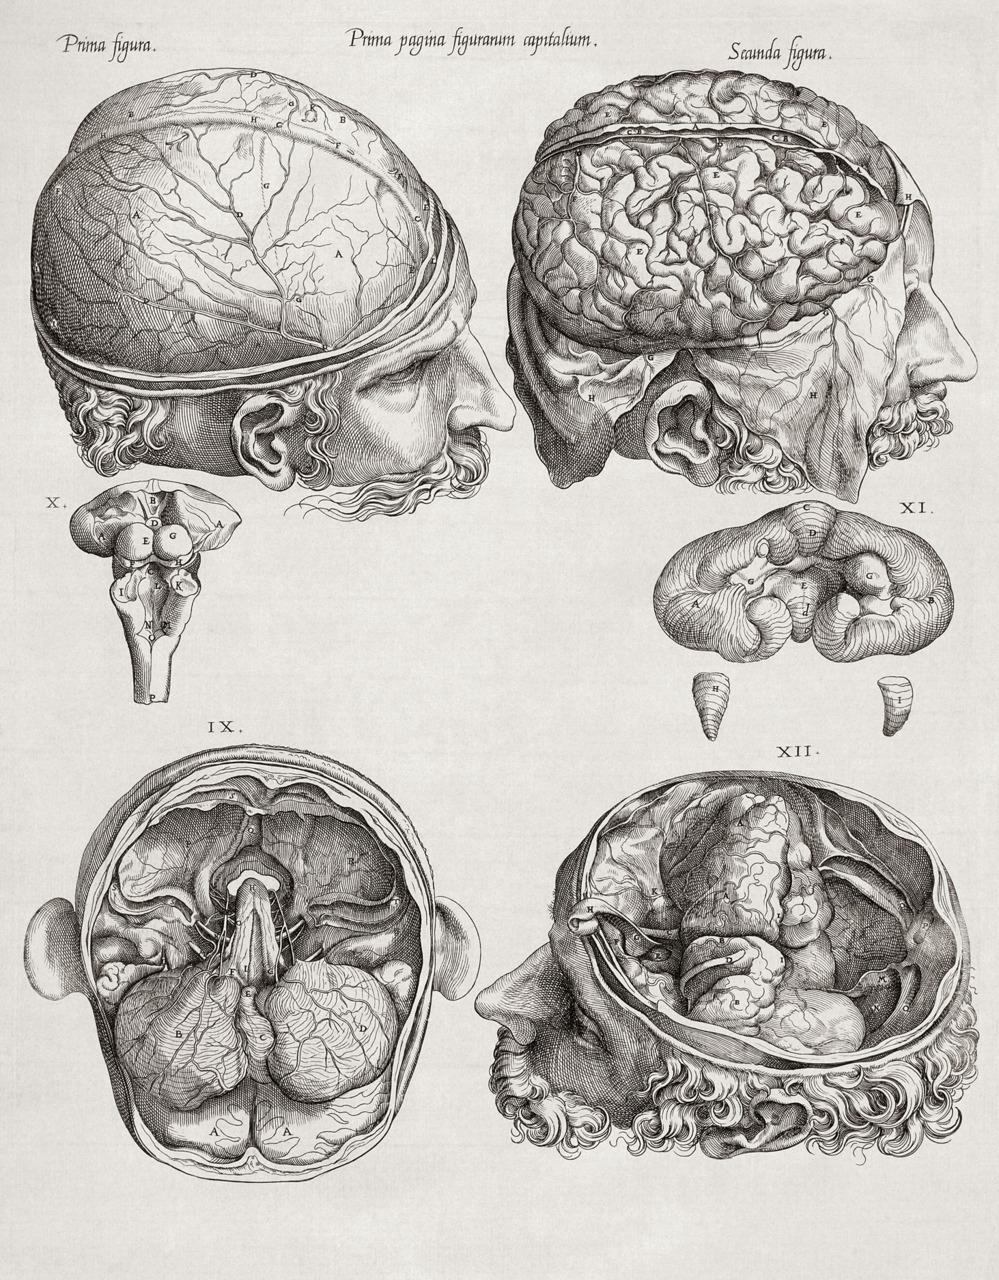 Drawn brains sketched Anatomy tumblr_ld3dwux7lu1qf9ueyo1_1280 illustrations jpg